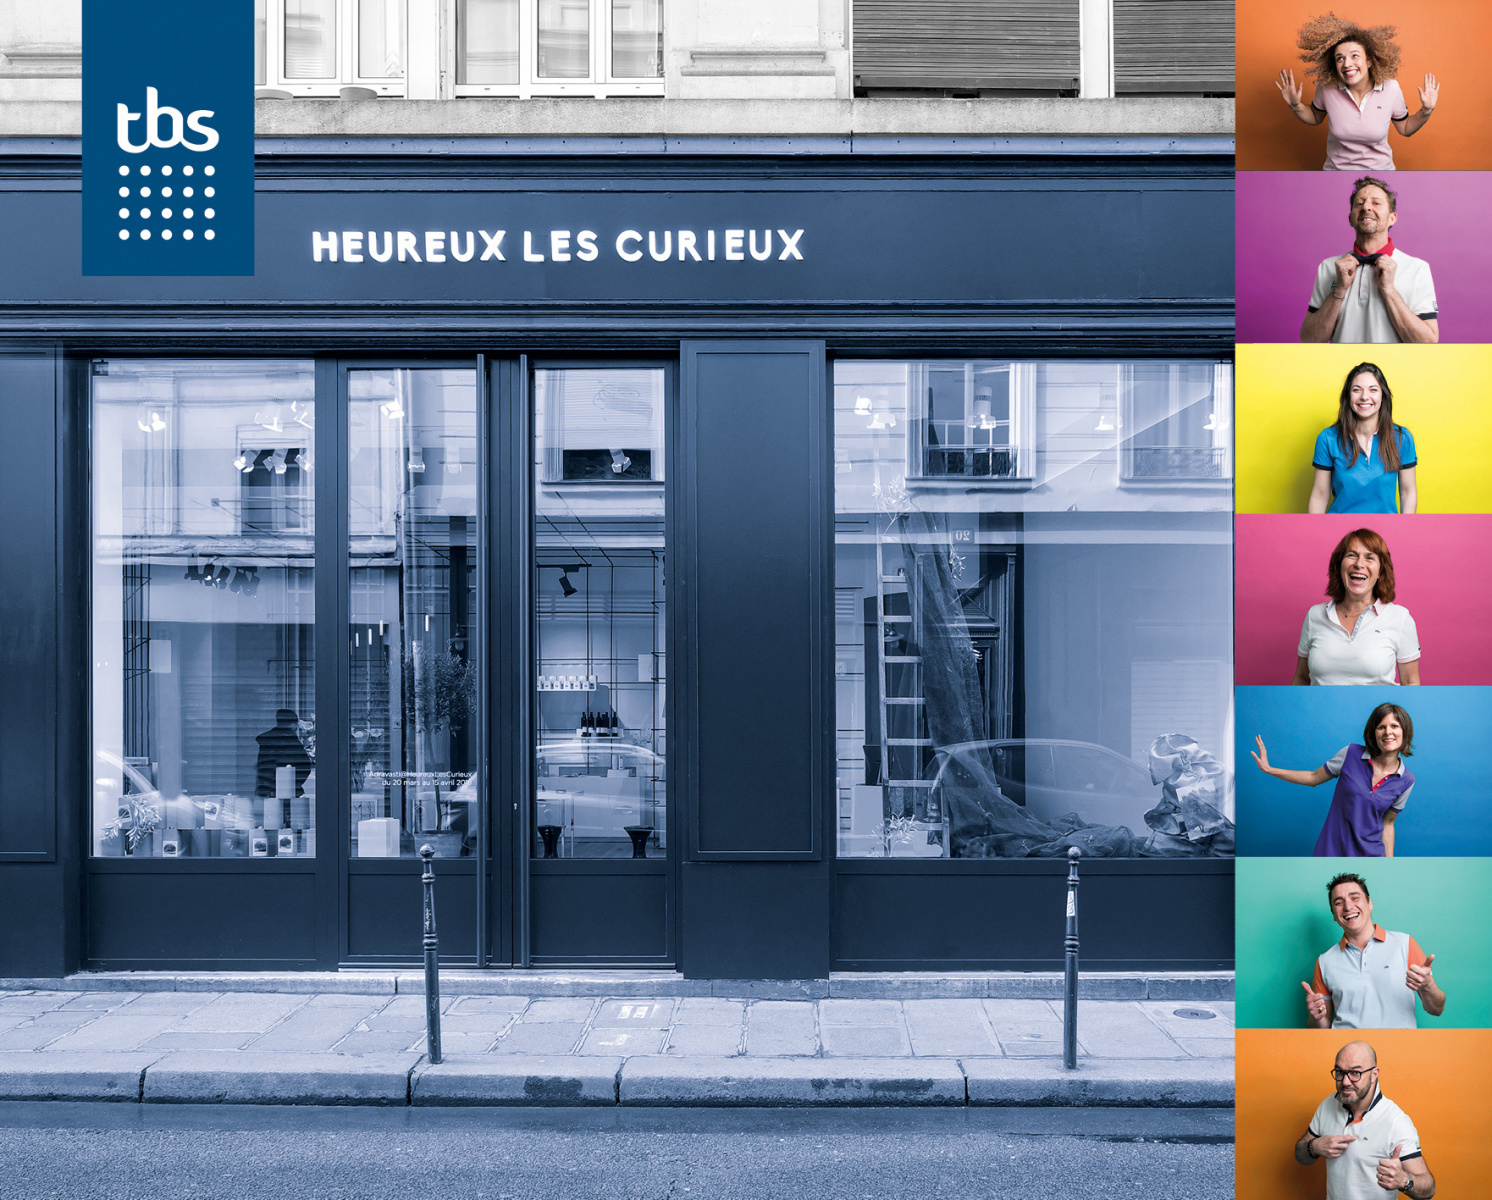 Un Pop Up Store Tbs Débarque à Paris Sortirapariscom